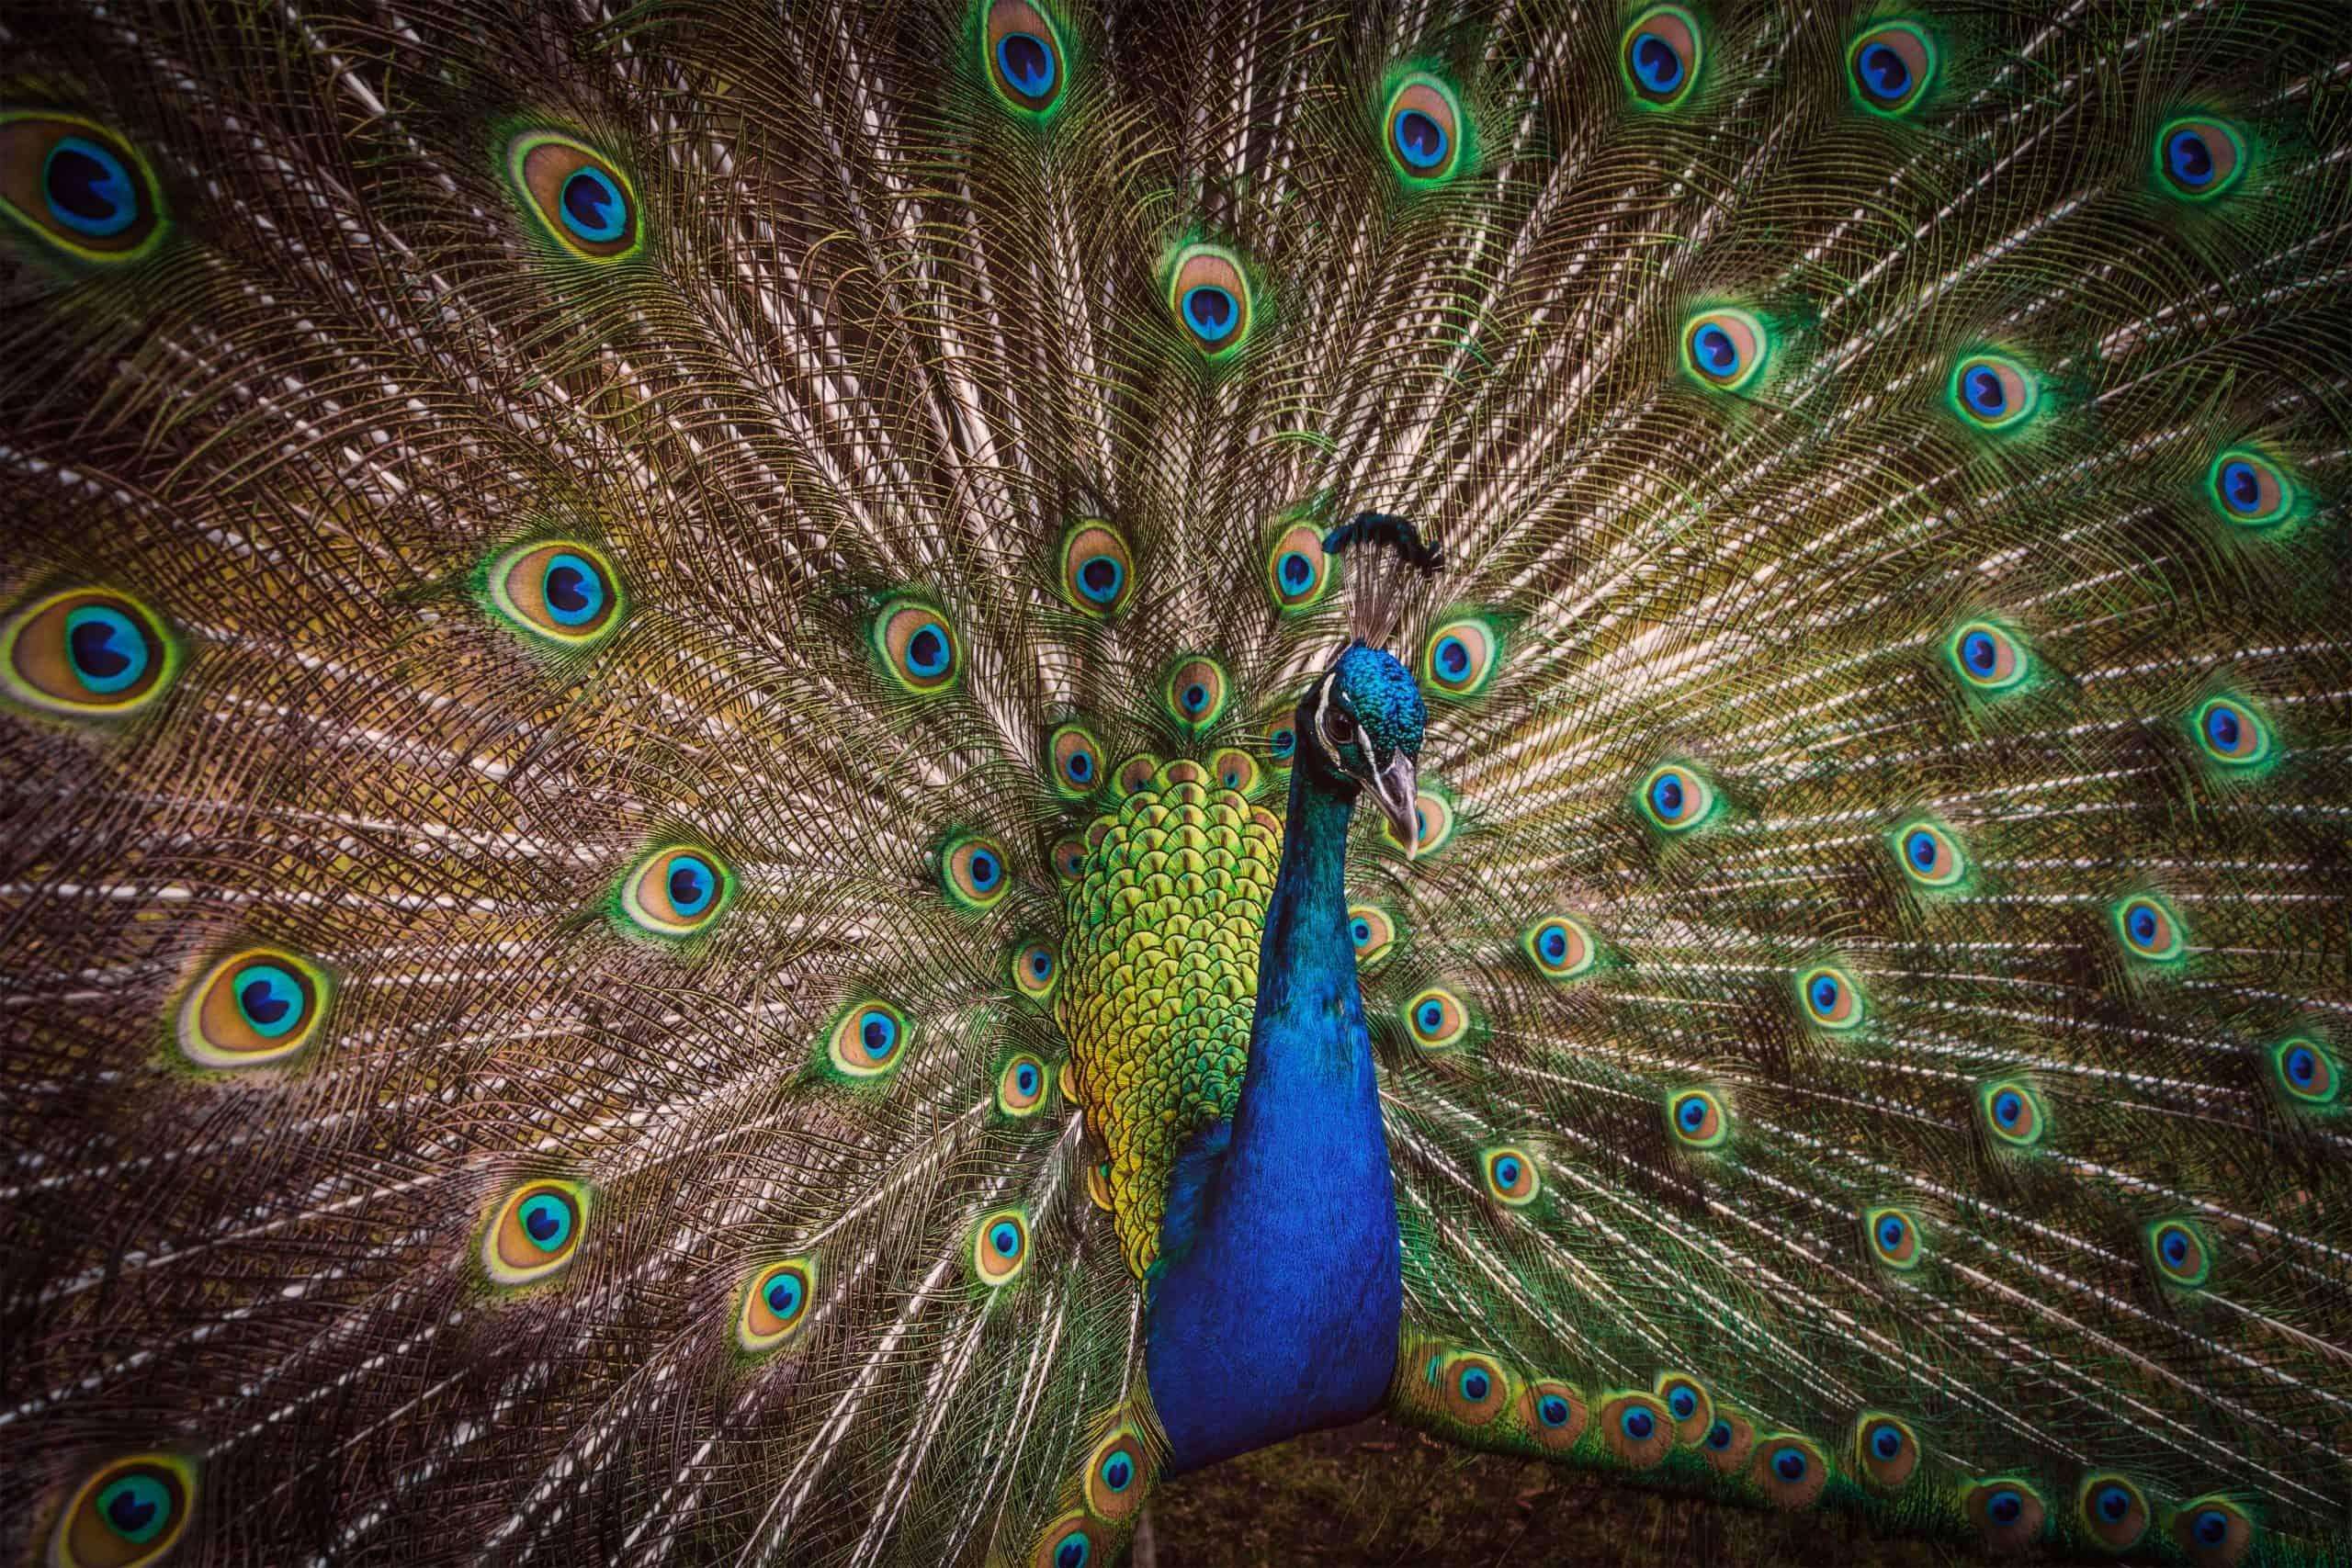 Peacock by Paul Carmona